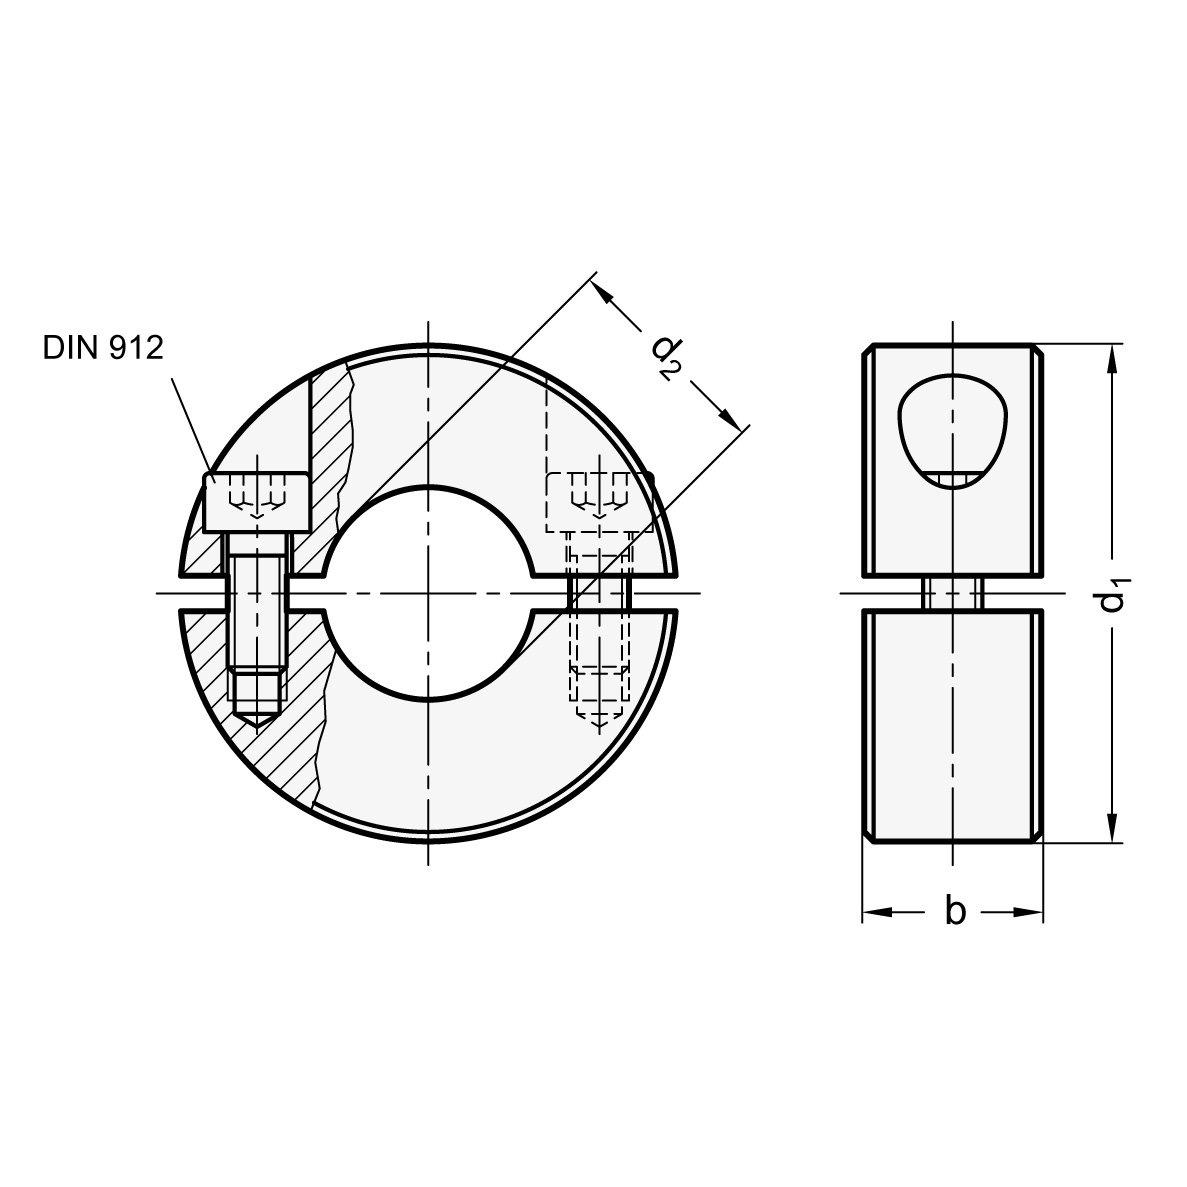 Bohrung d2 B30 55mm schwarz dampfoxidiert Durchmesser d1 Ganter Normelemente GN 707.2-55-B30-ST 2-55-B30-ST-Geteilte Stellringe